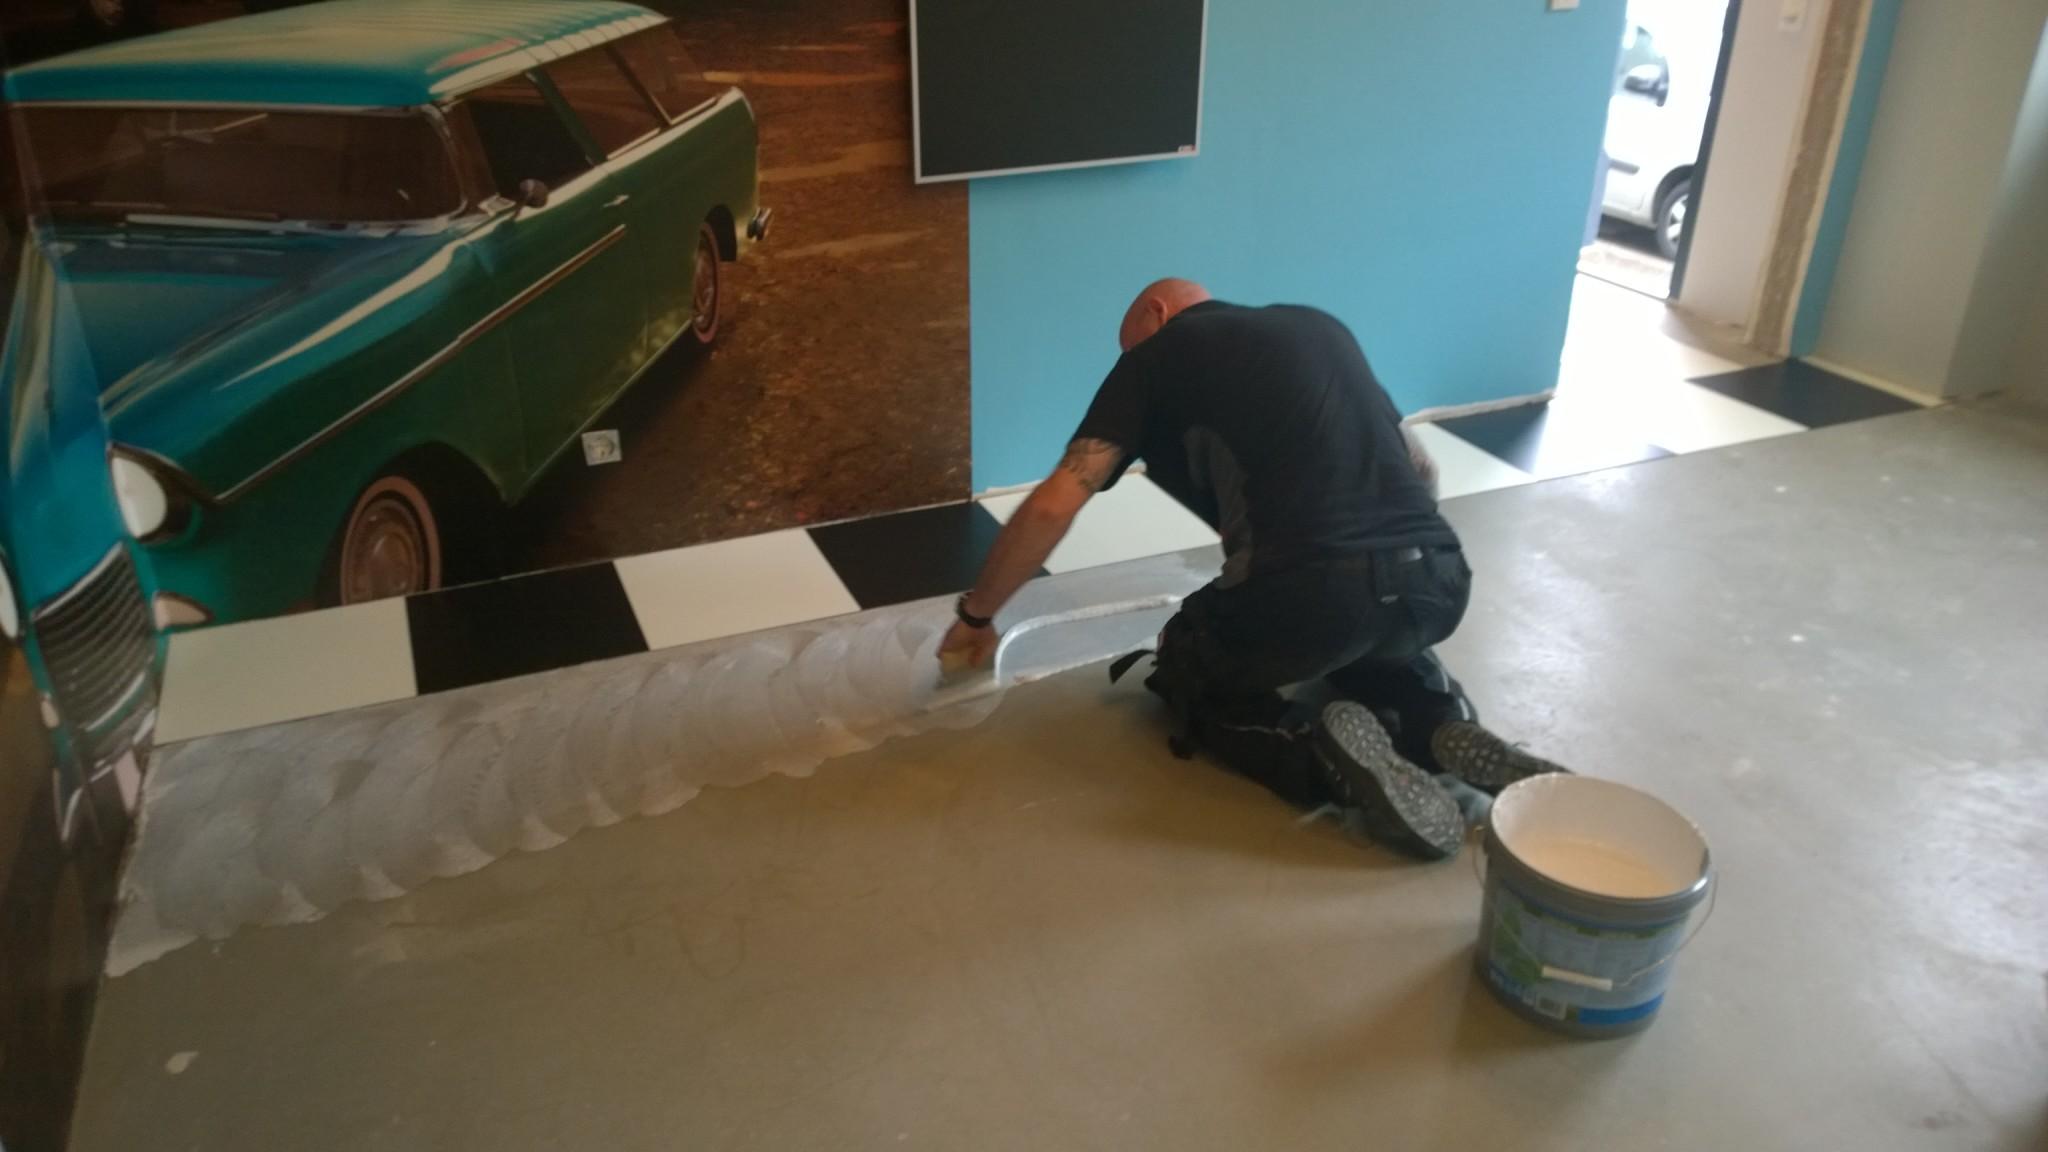 Fußbodenbelag Fliesenoptik ~ Vinyl bodenbelag fliesenoptik im küchenbereich lang bodendesign